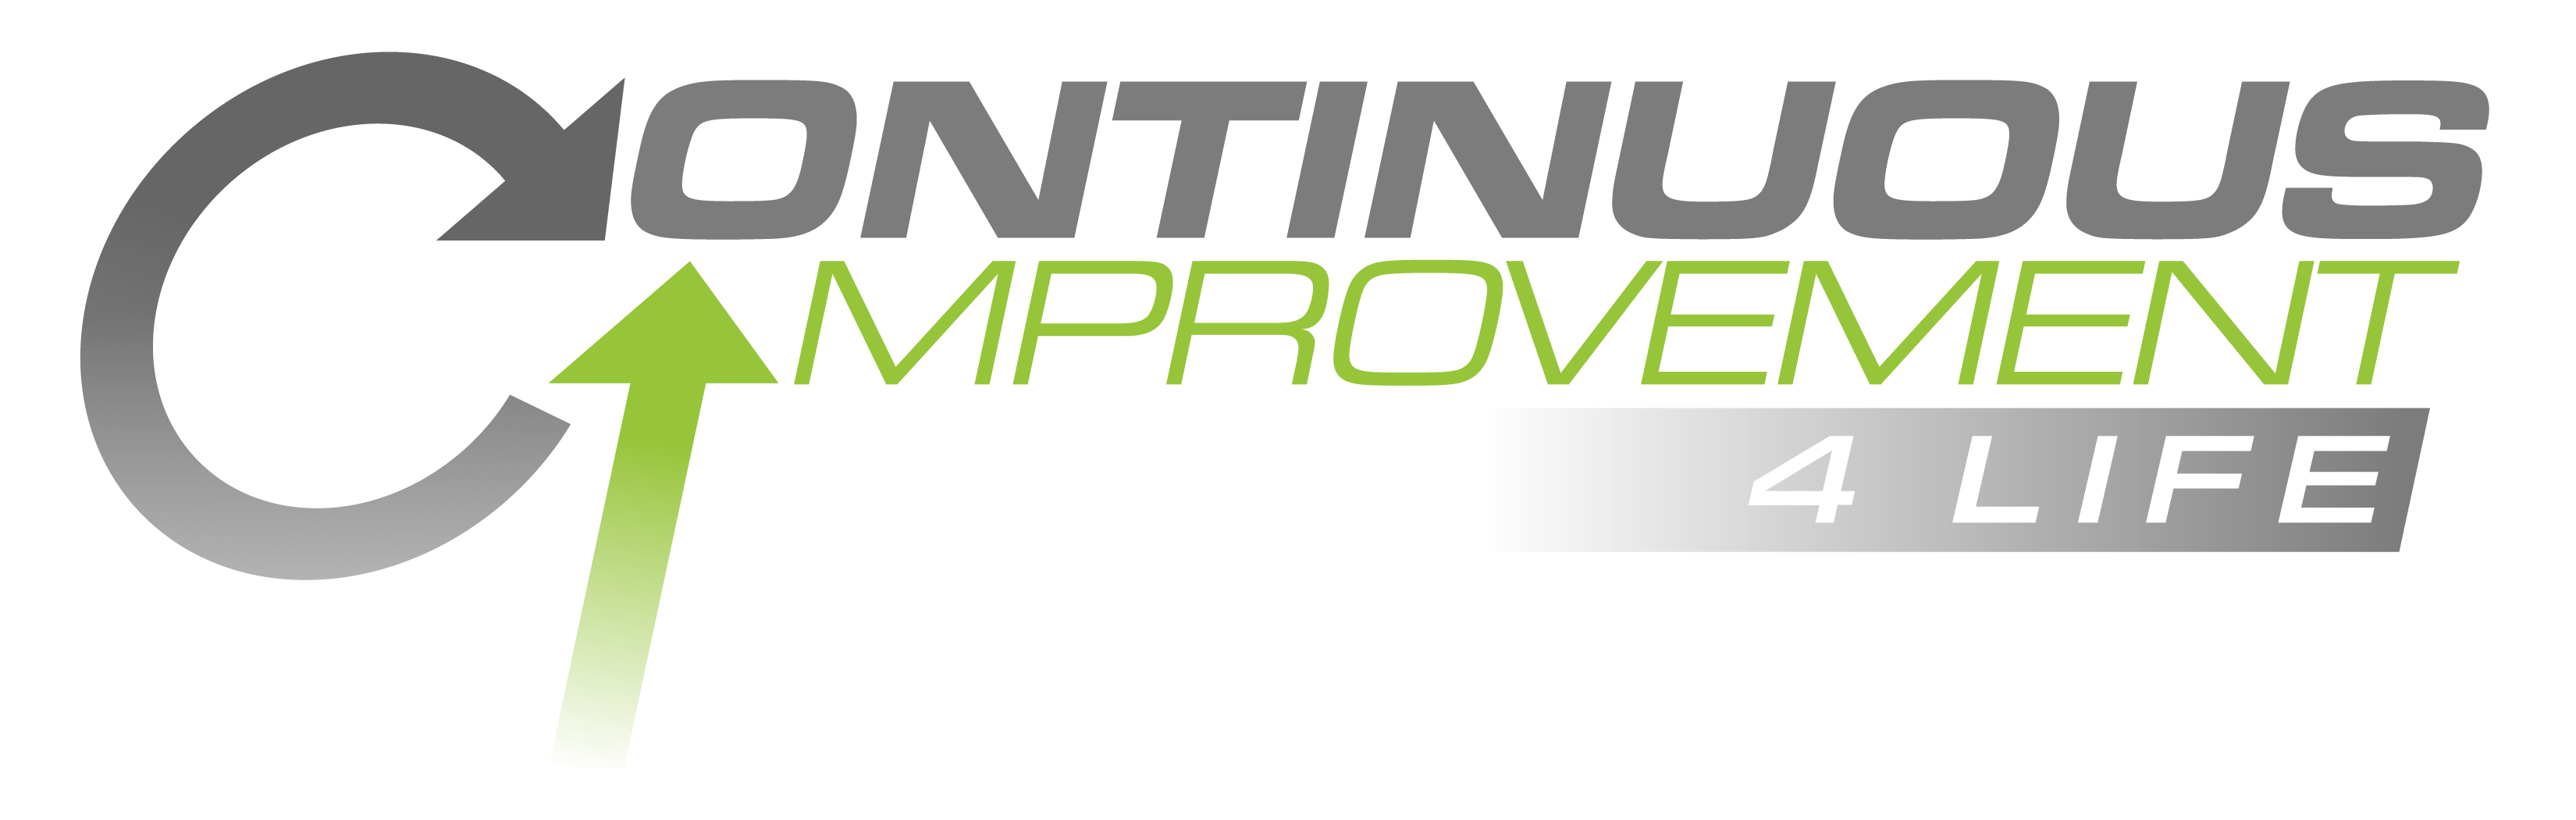 Continuous Improvements 4 Life Logo